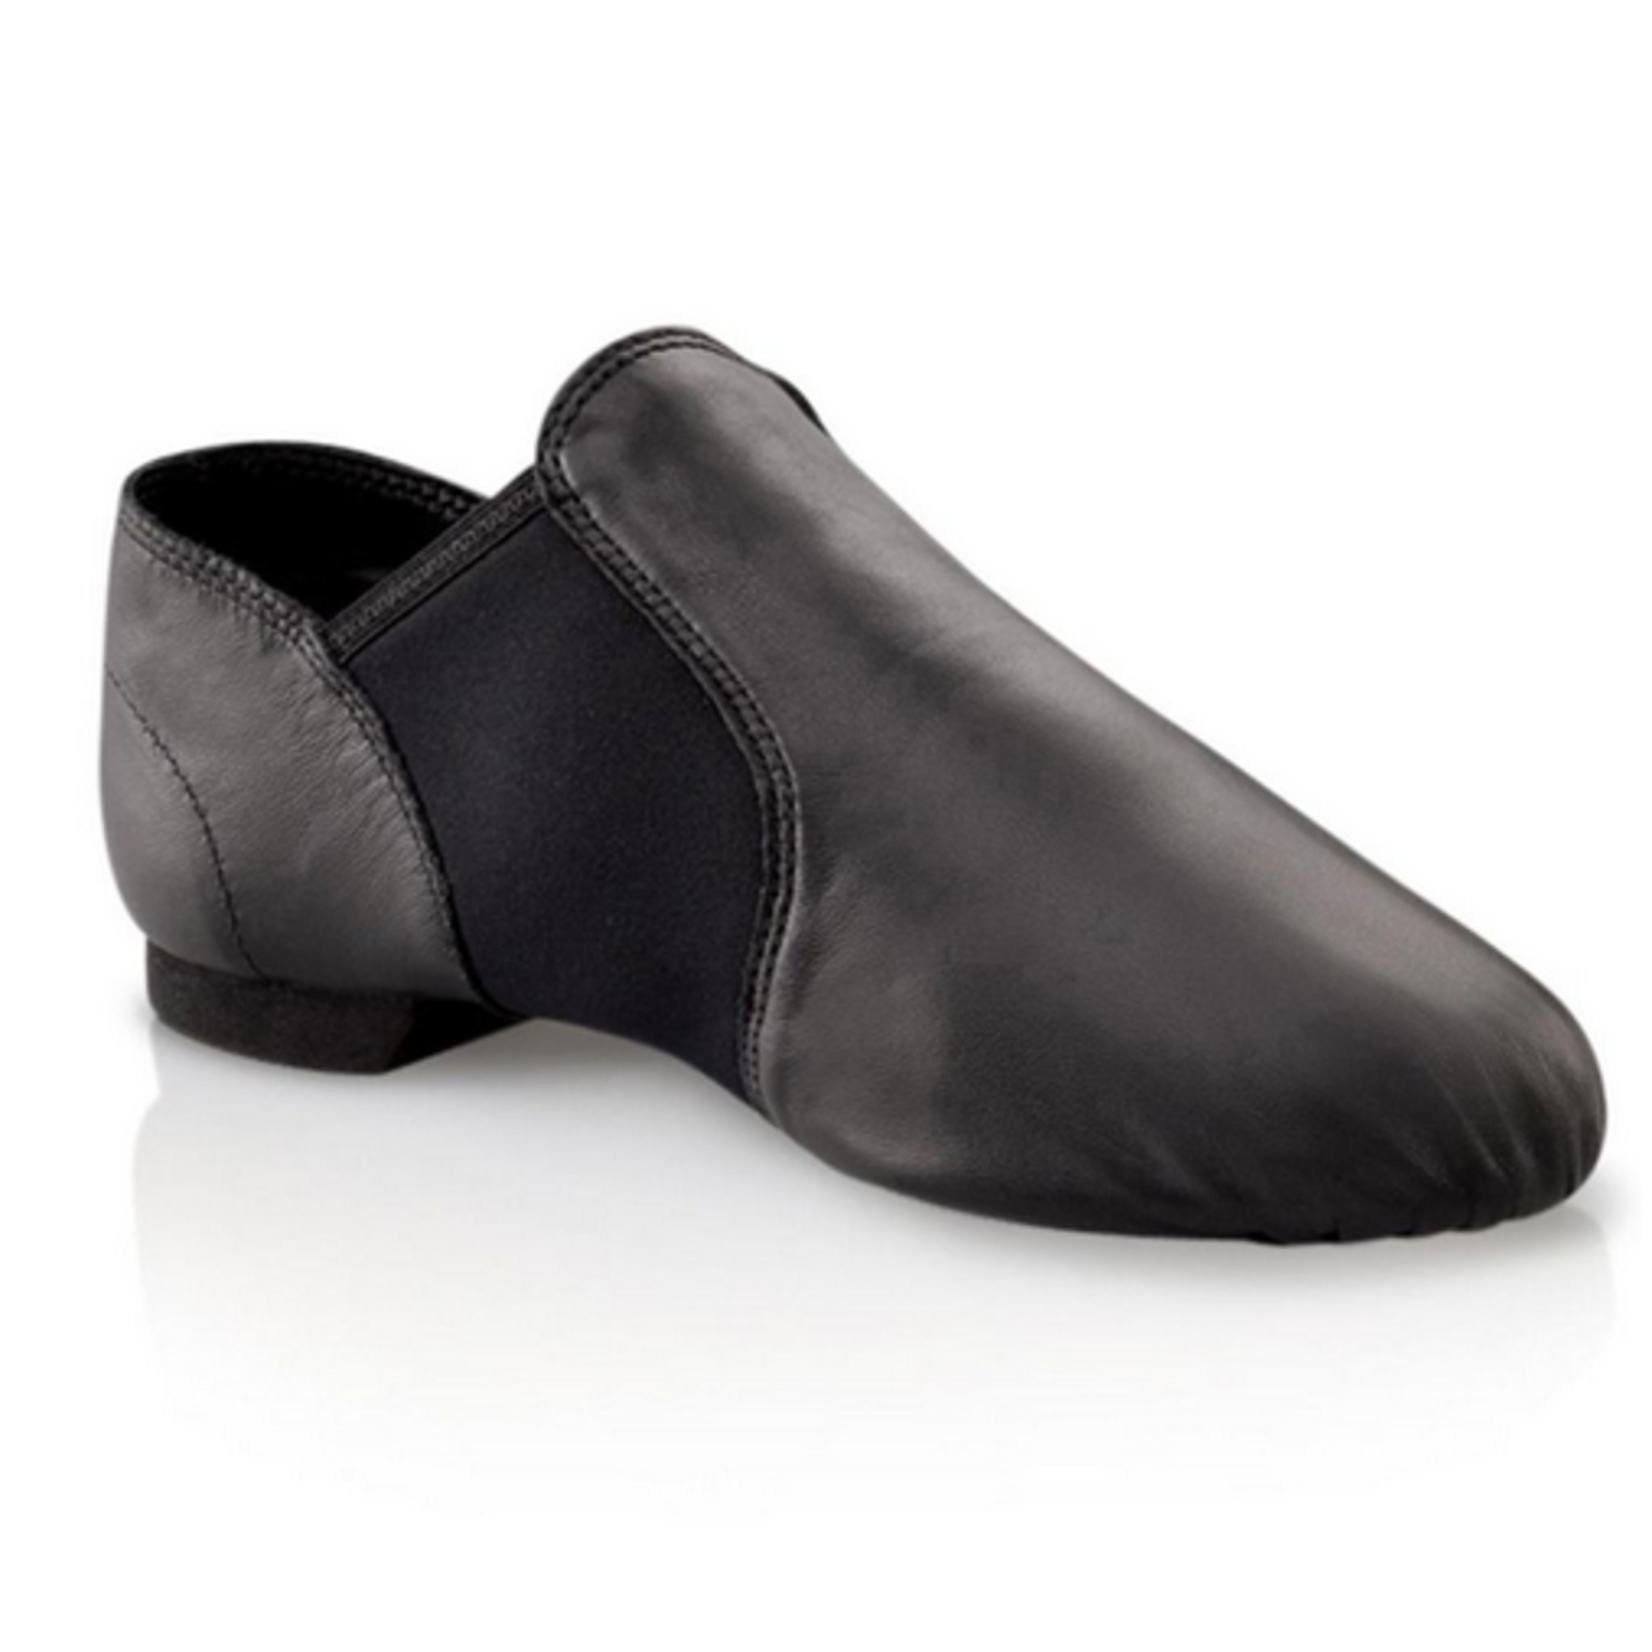 Capezio Capezio EJ2/EJ2A Slip-on Jazz Shoes